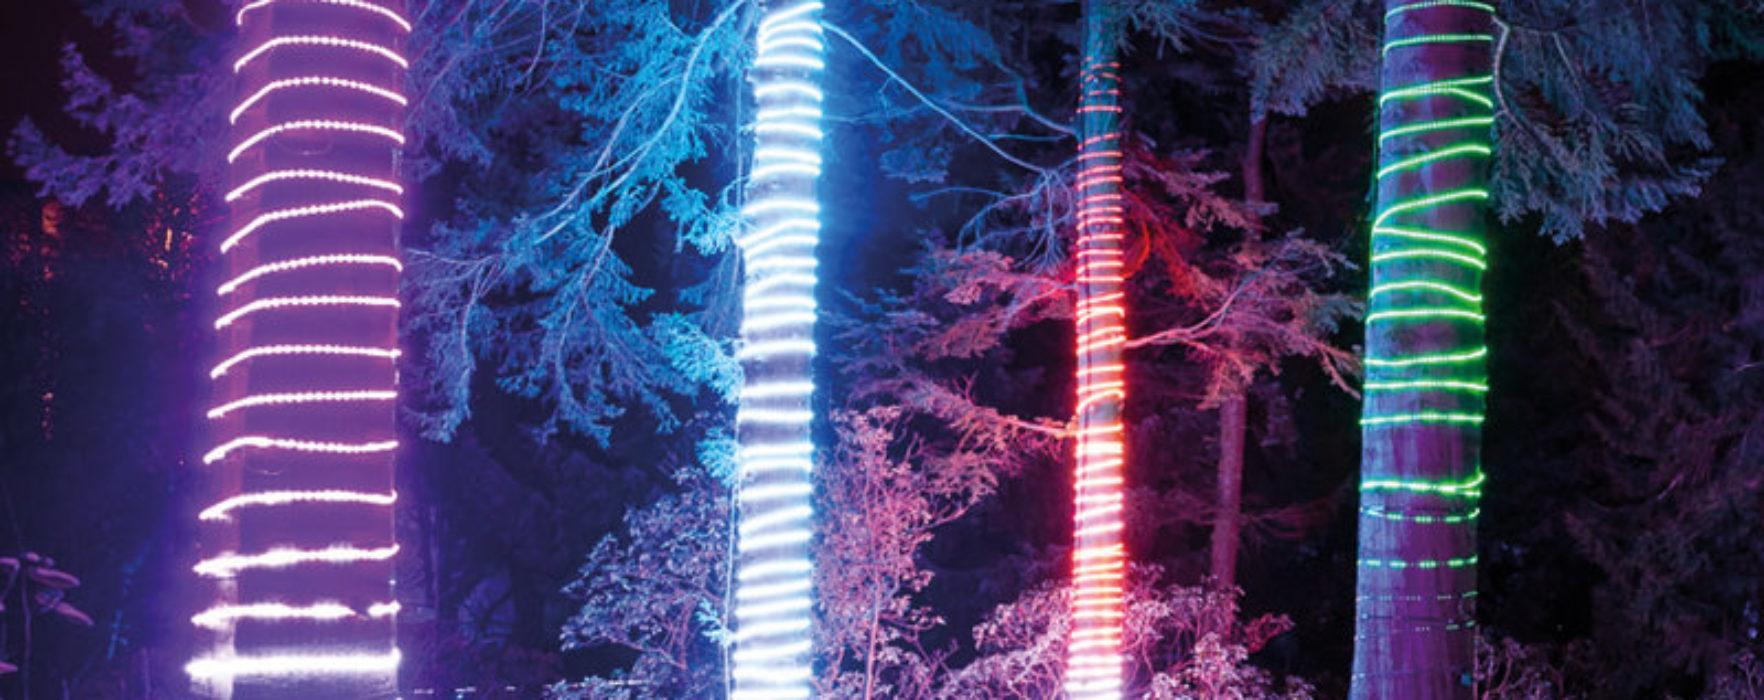 Christmas at Dunham Massey – The magical after-dark illuminated trail